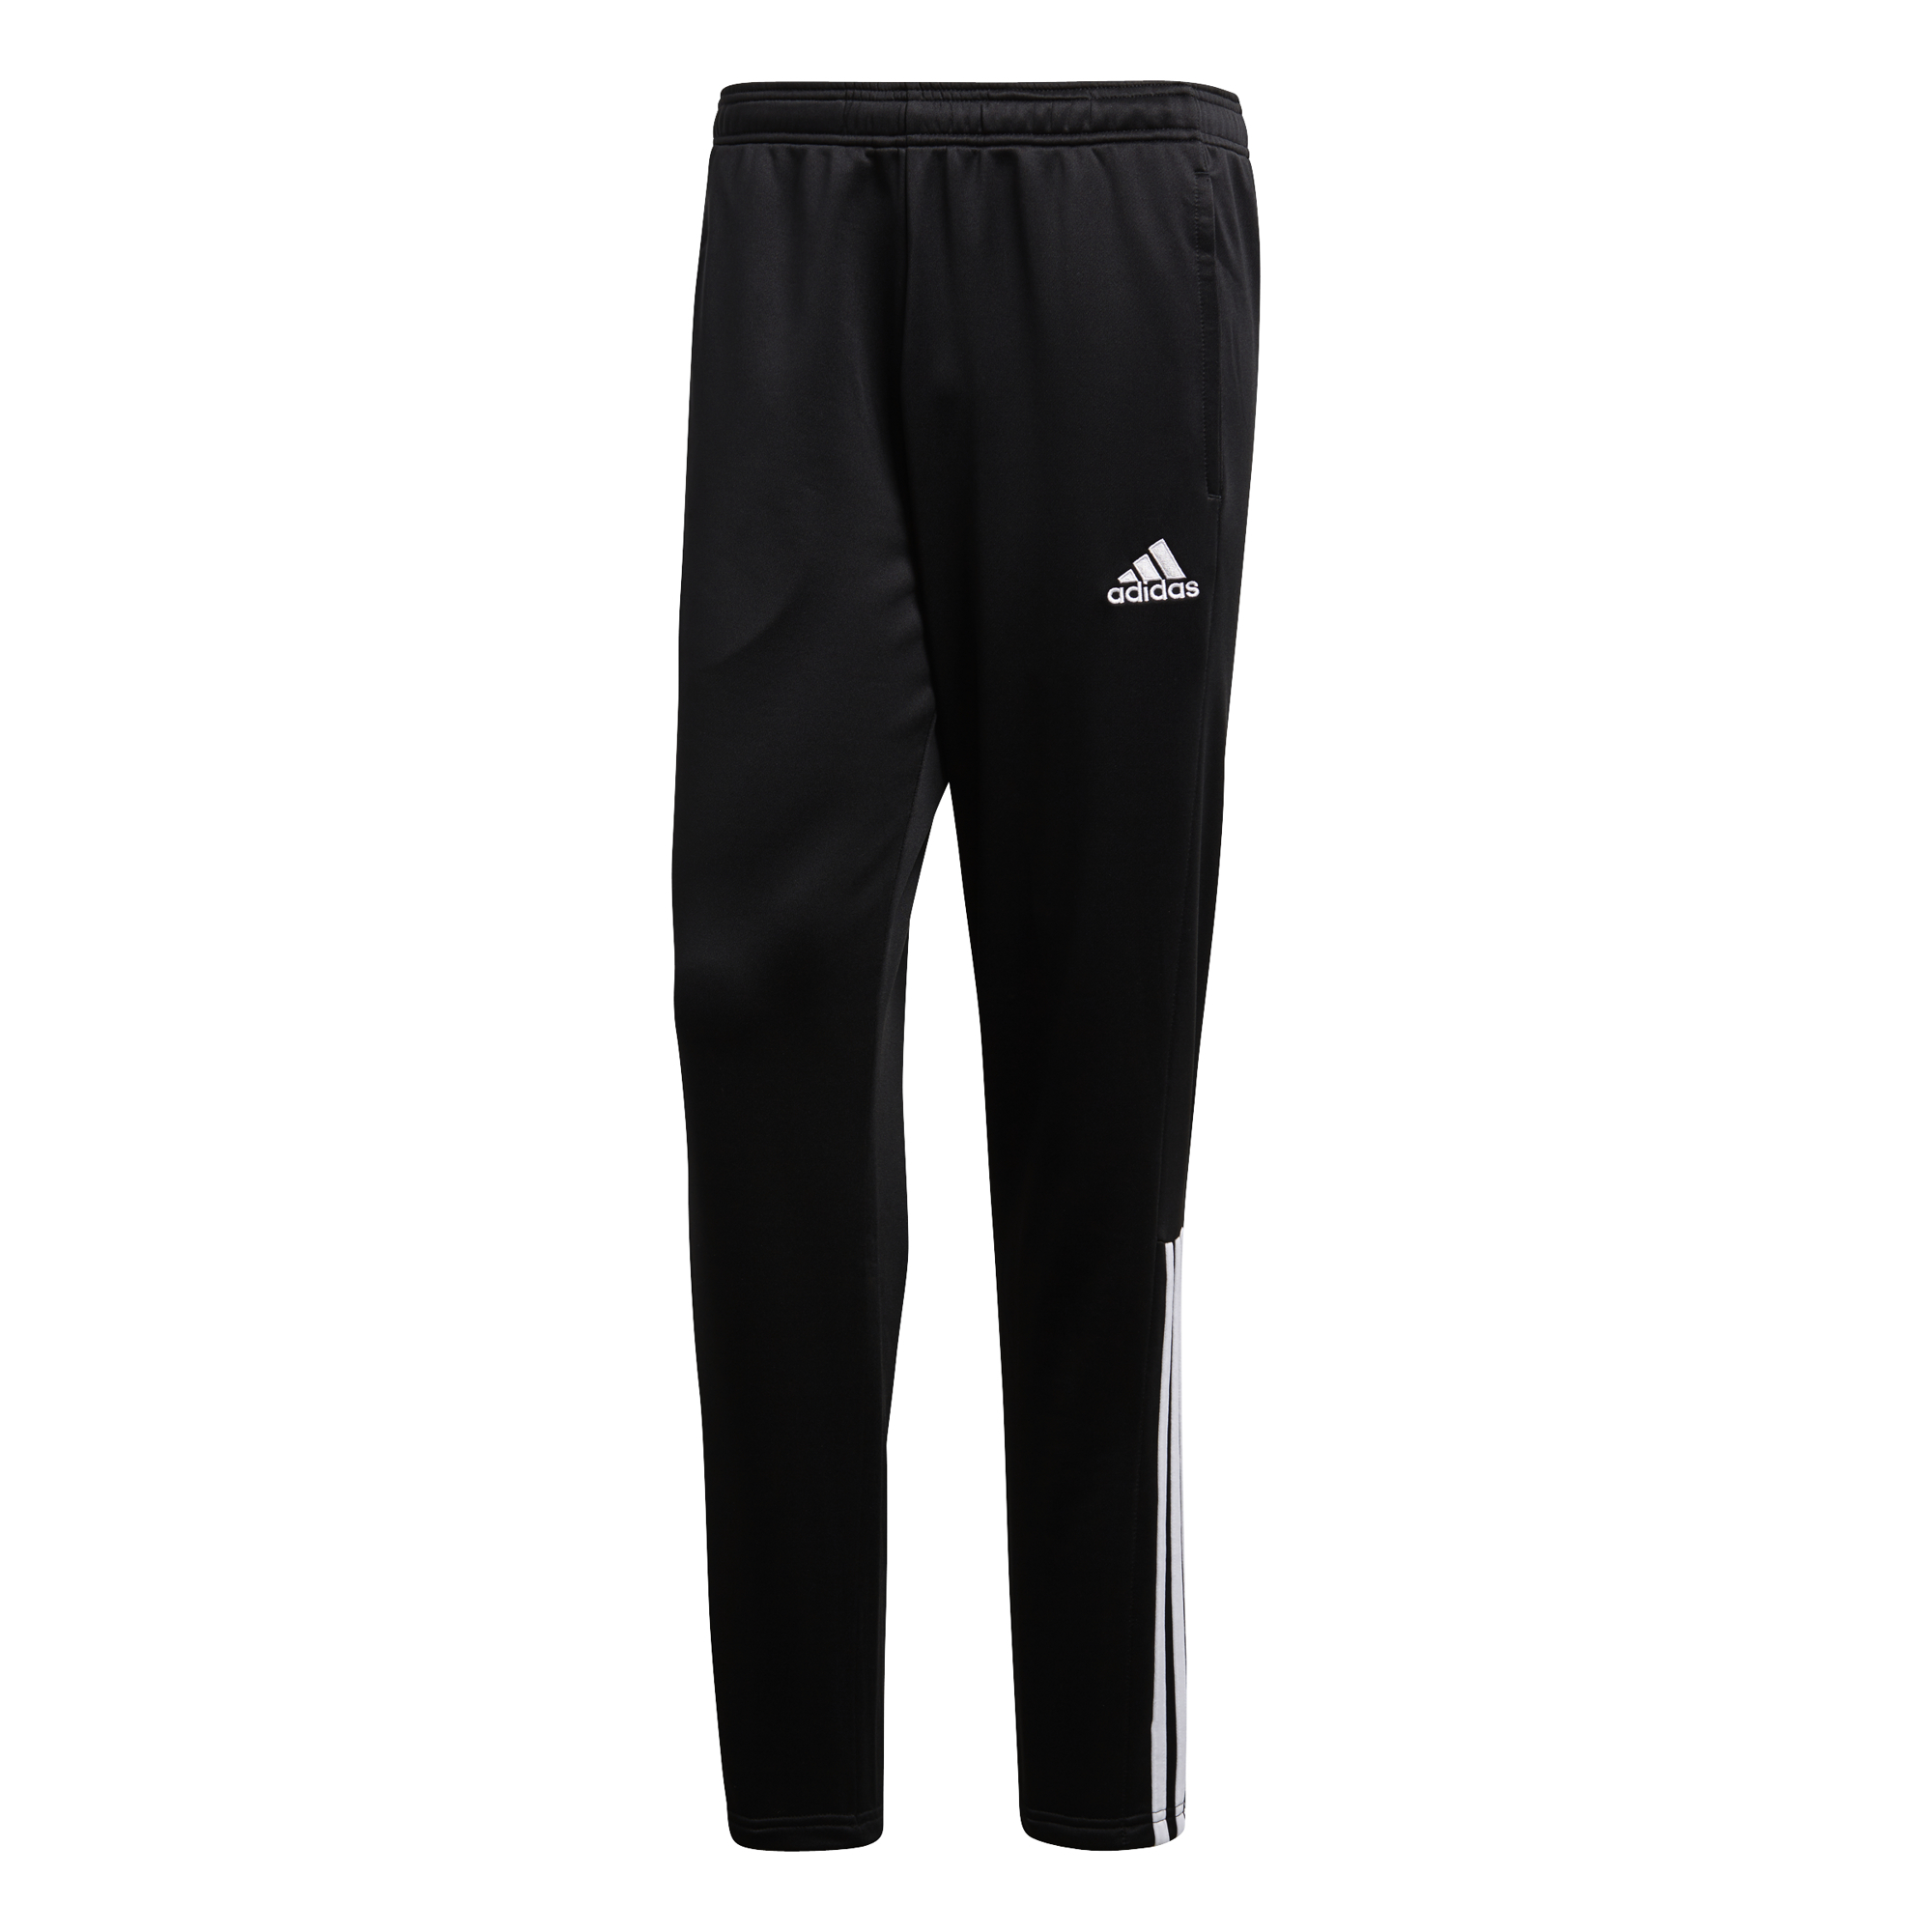 ADIDAS polyesterové kalhoty Regista 18